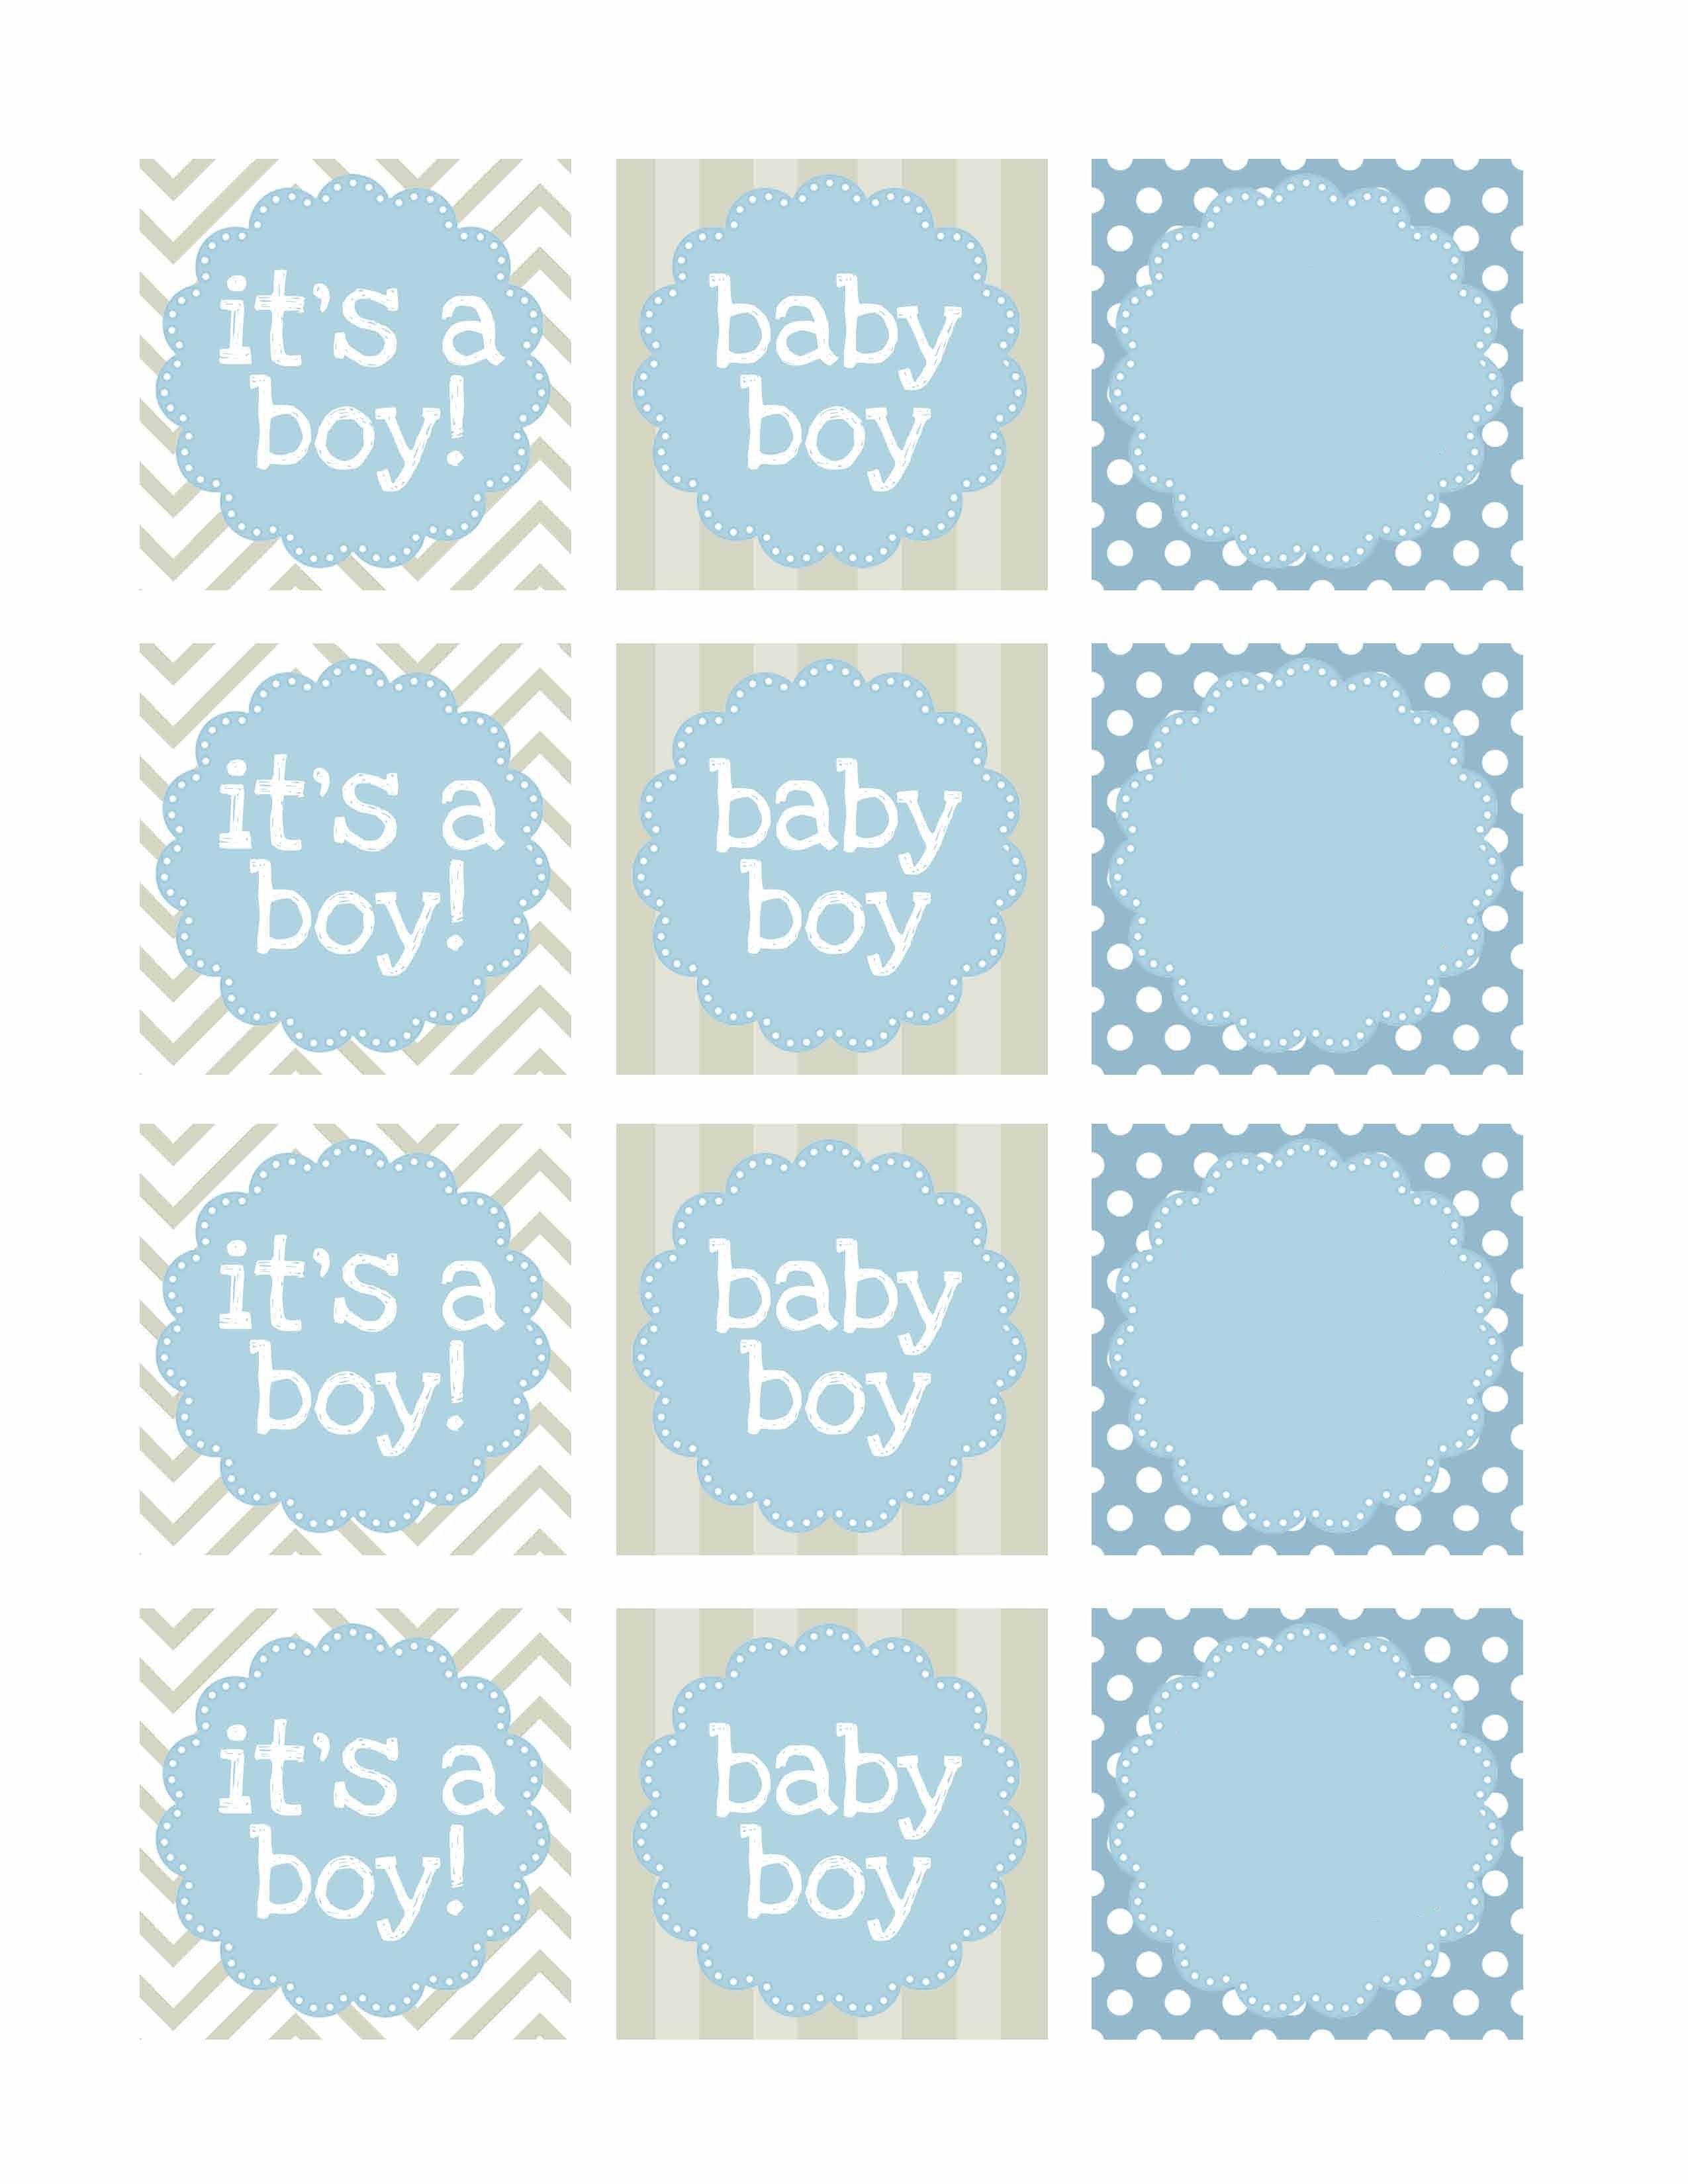 Boy Baby Shower Free Printables | Baby Shower | Baby Shower Labels - Baby Shower Bunting Free Printable